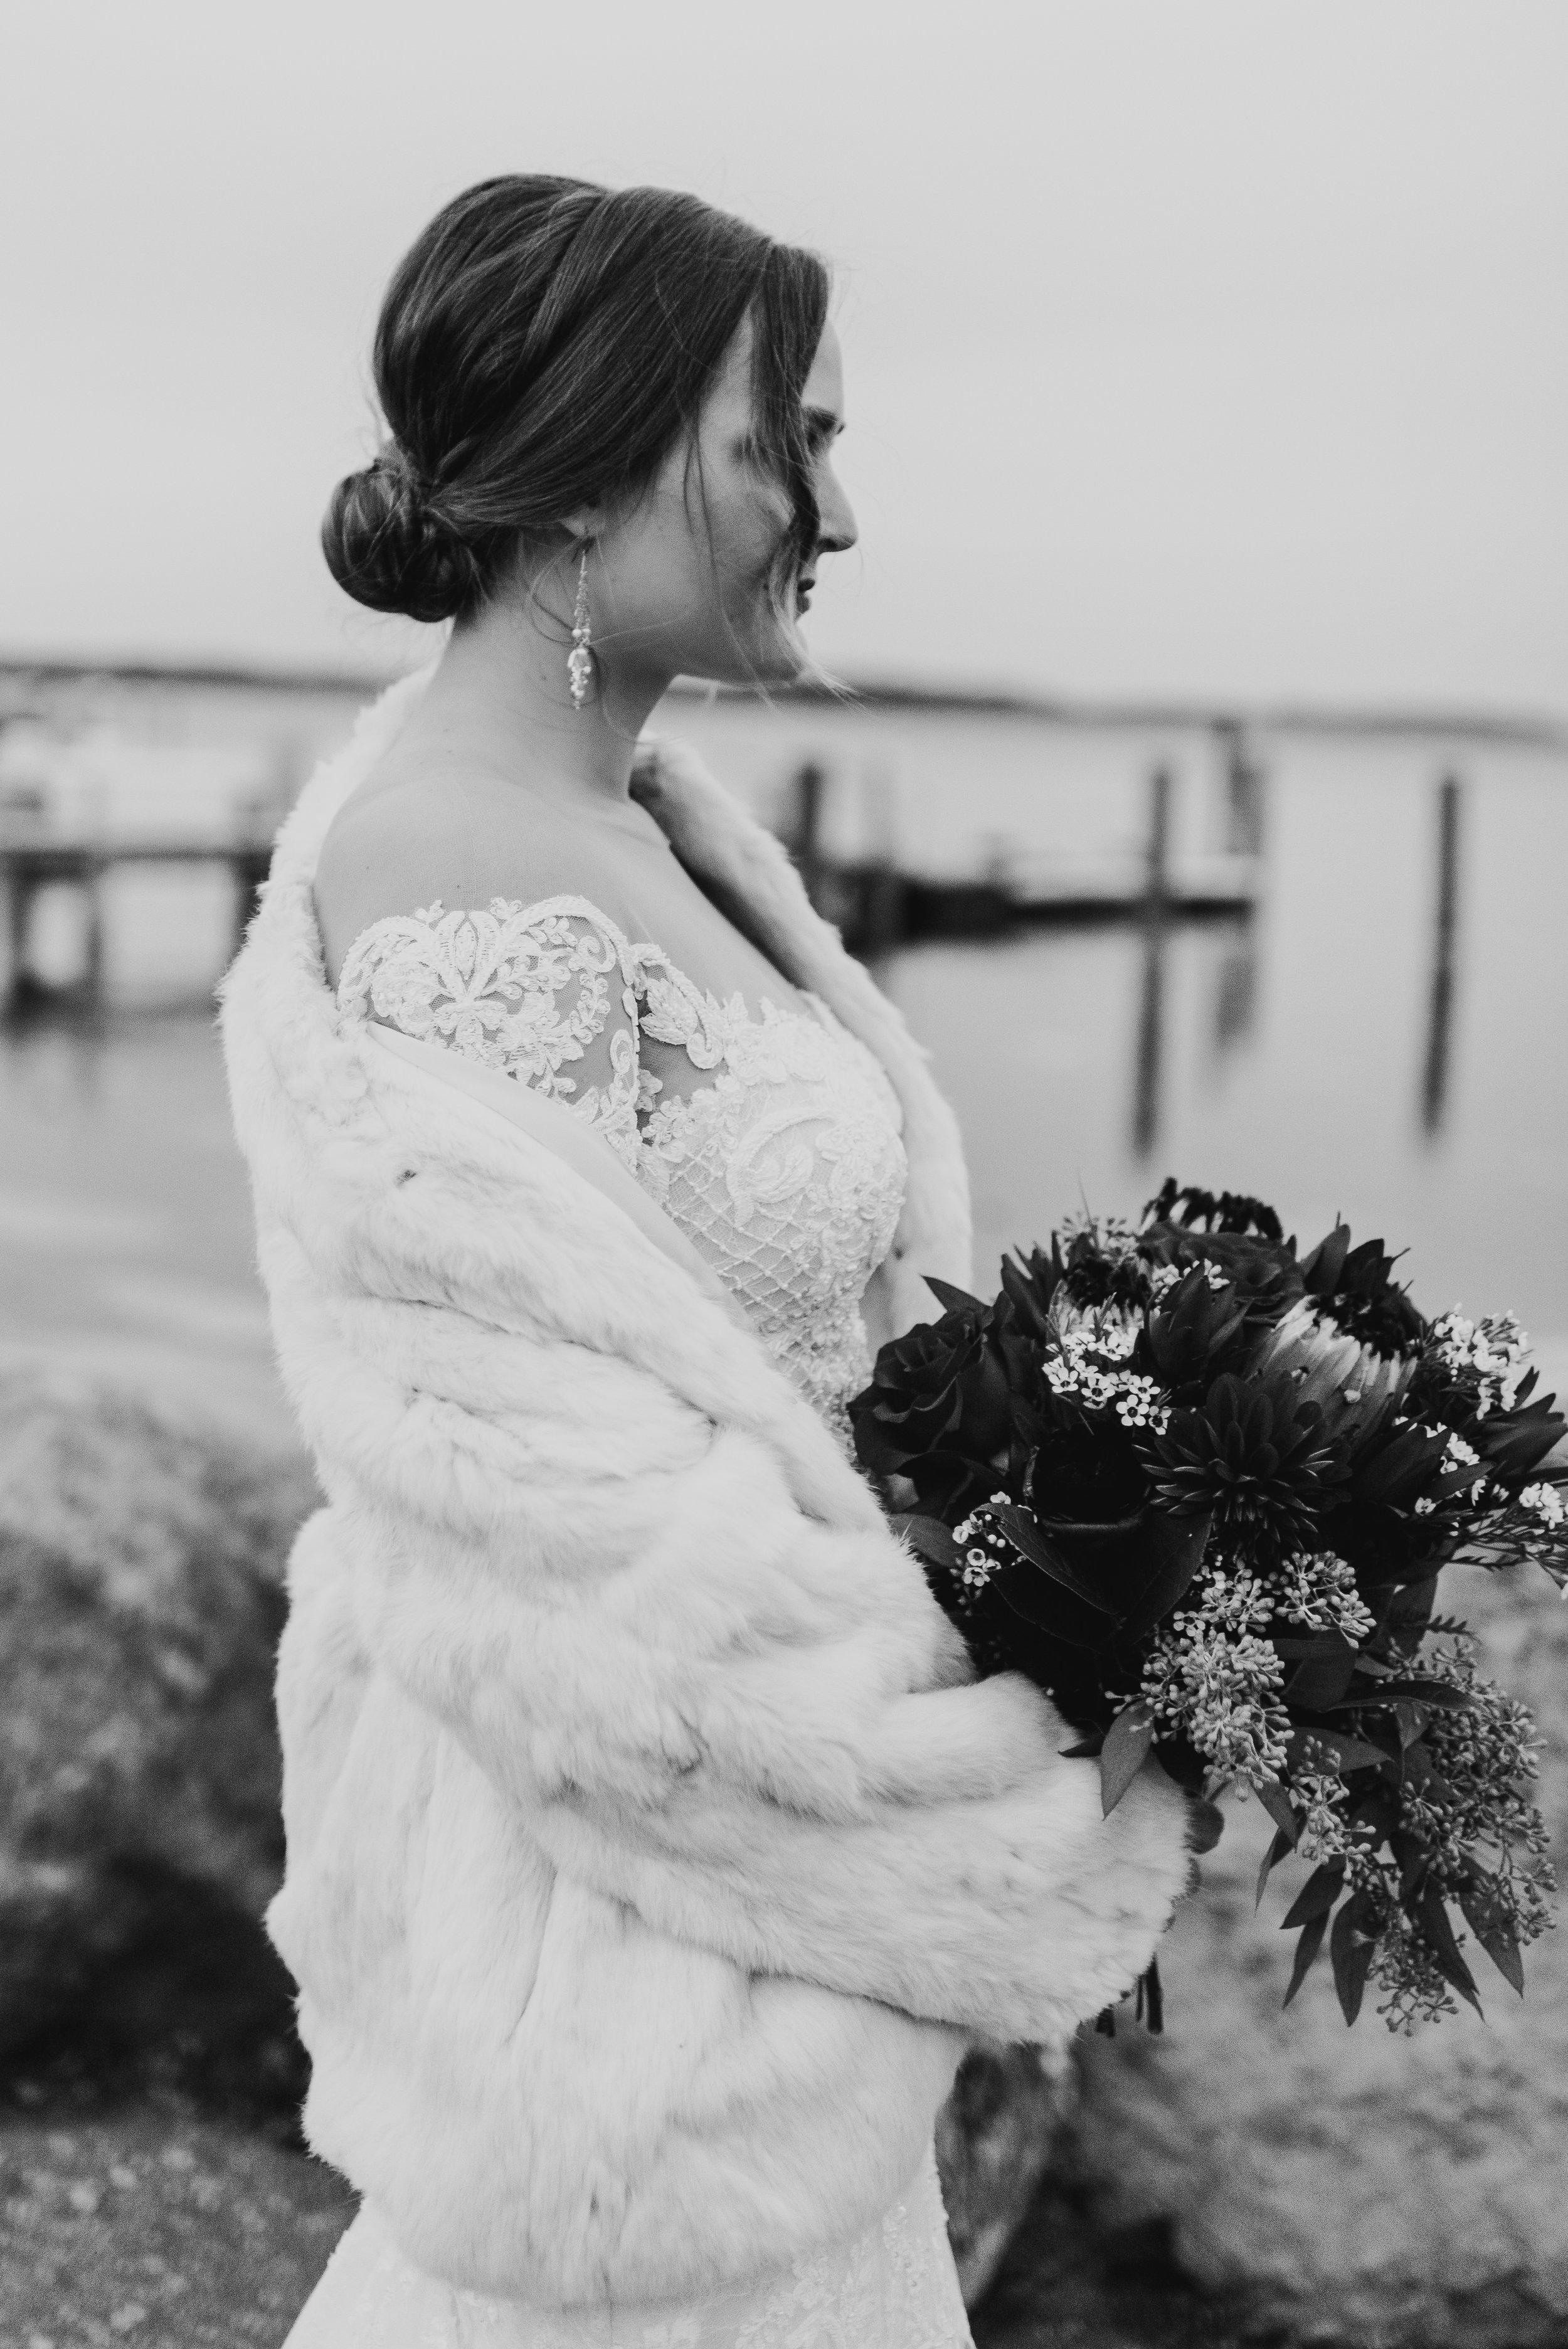 Steena-Anne-Photography-Ellen-Tevin-Excelsior-Elopement92.jpg